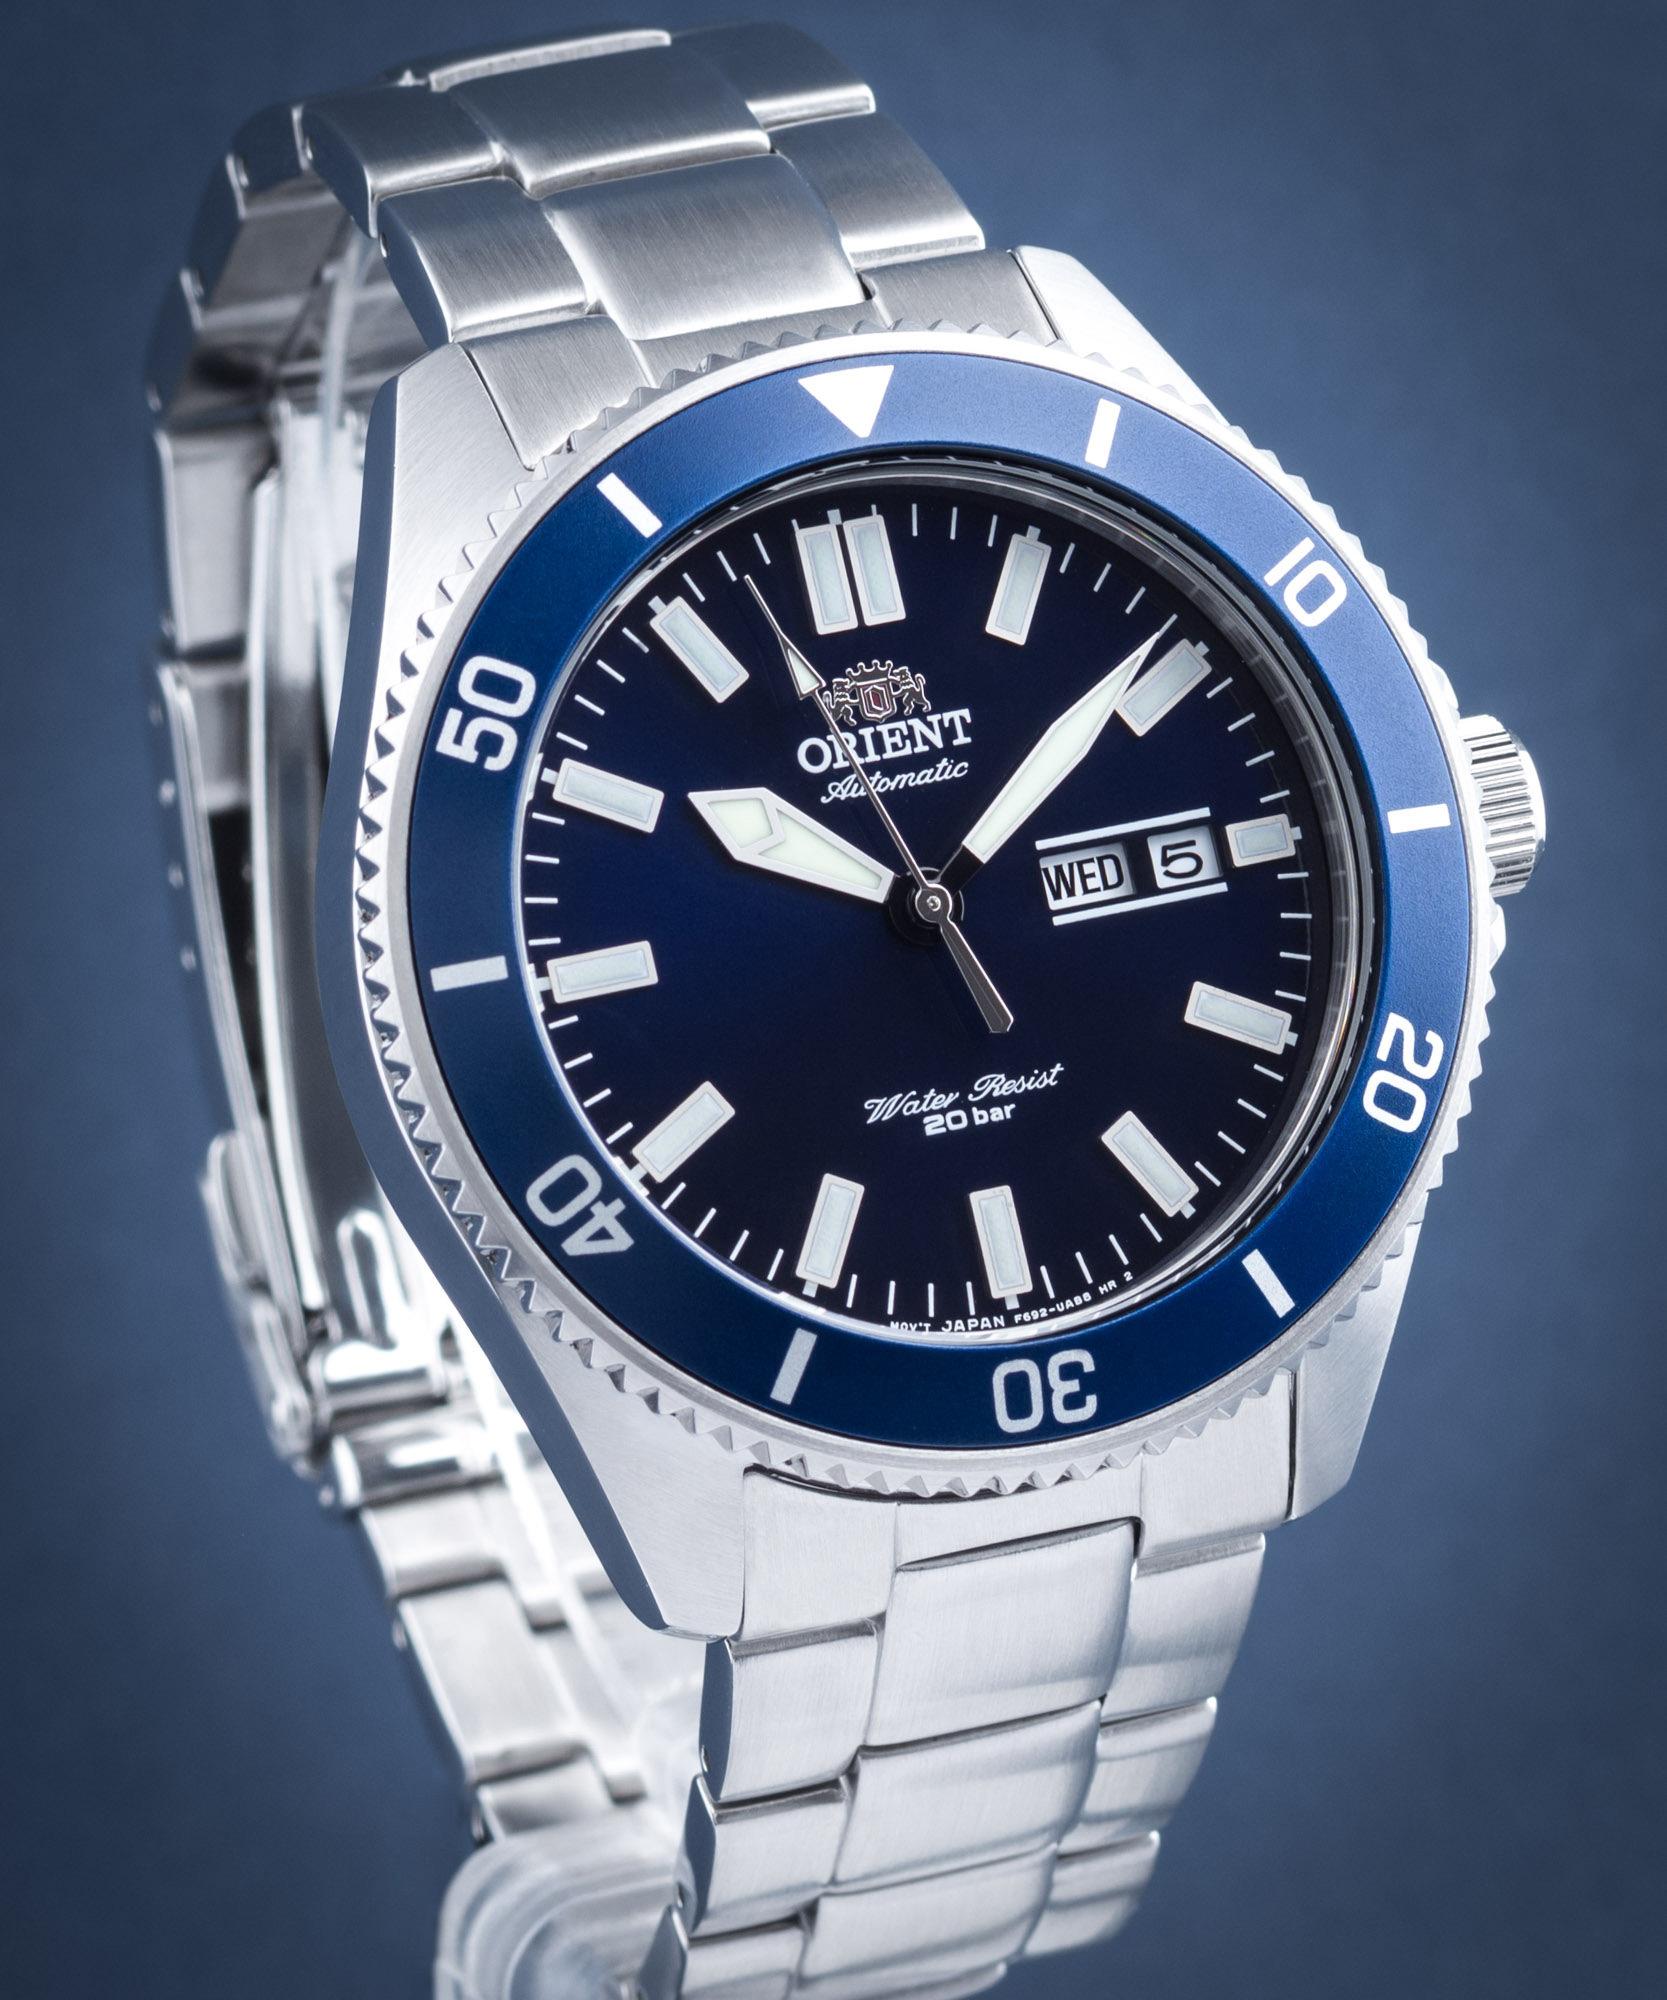 Zegarek męski Orient Big Mako XL Diver Automatic